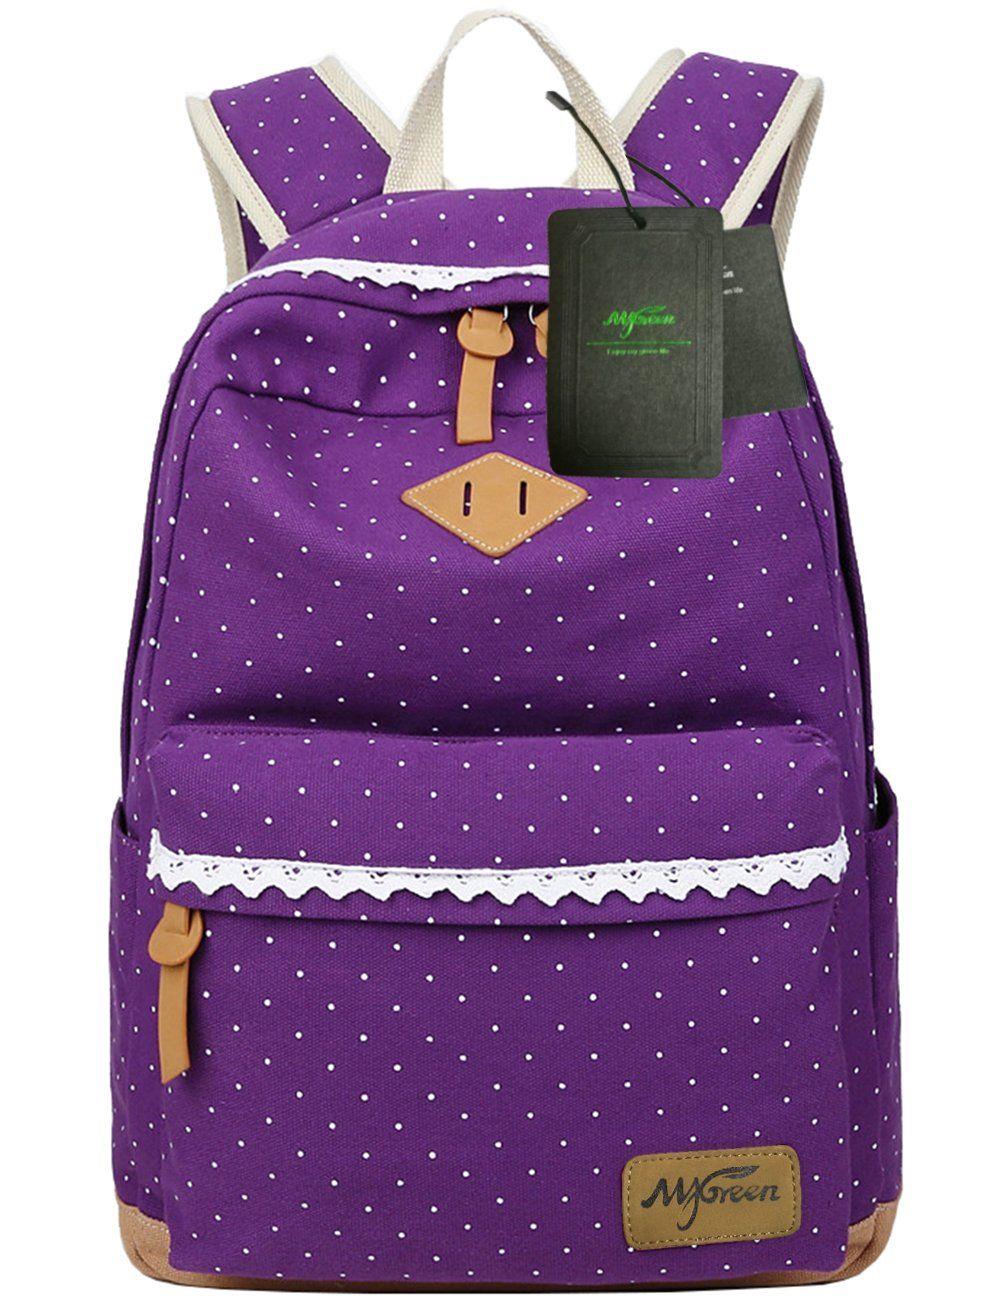 Mygreen Polka Dot Canvas School Backpack Bag Cute Bookbag For S Womens Medium Purple